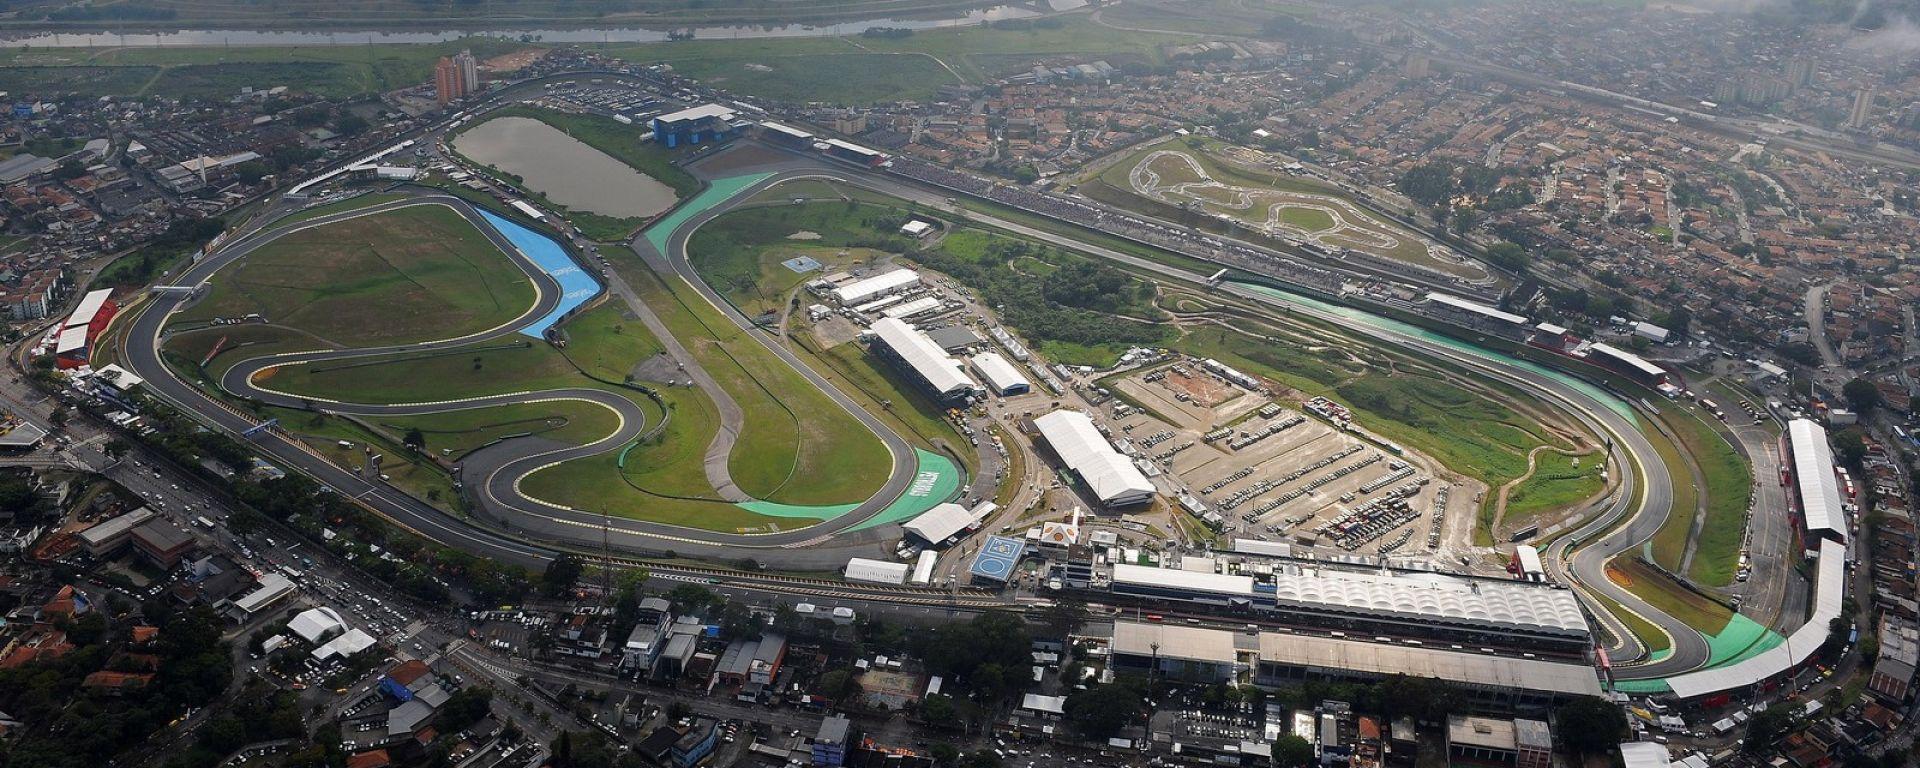 F1 GP Brasile 2018, tutte le info: orari, risultati prove, qualifica, gara